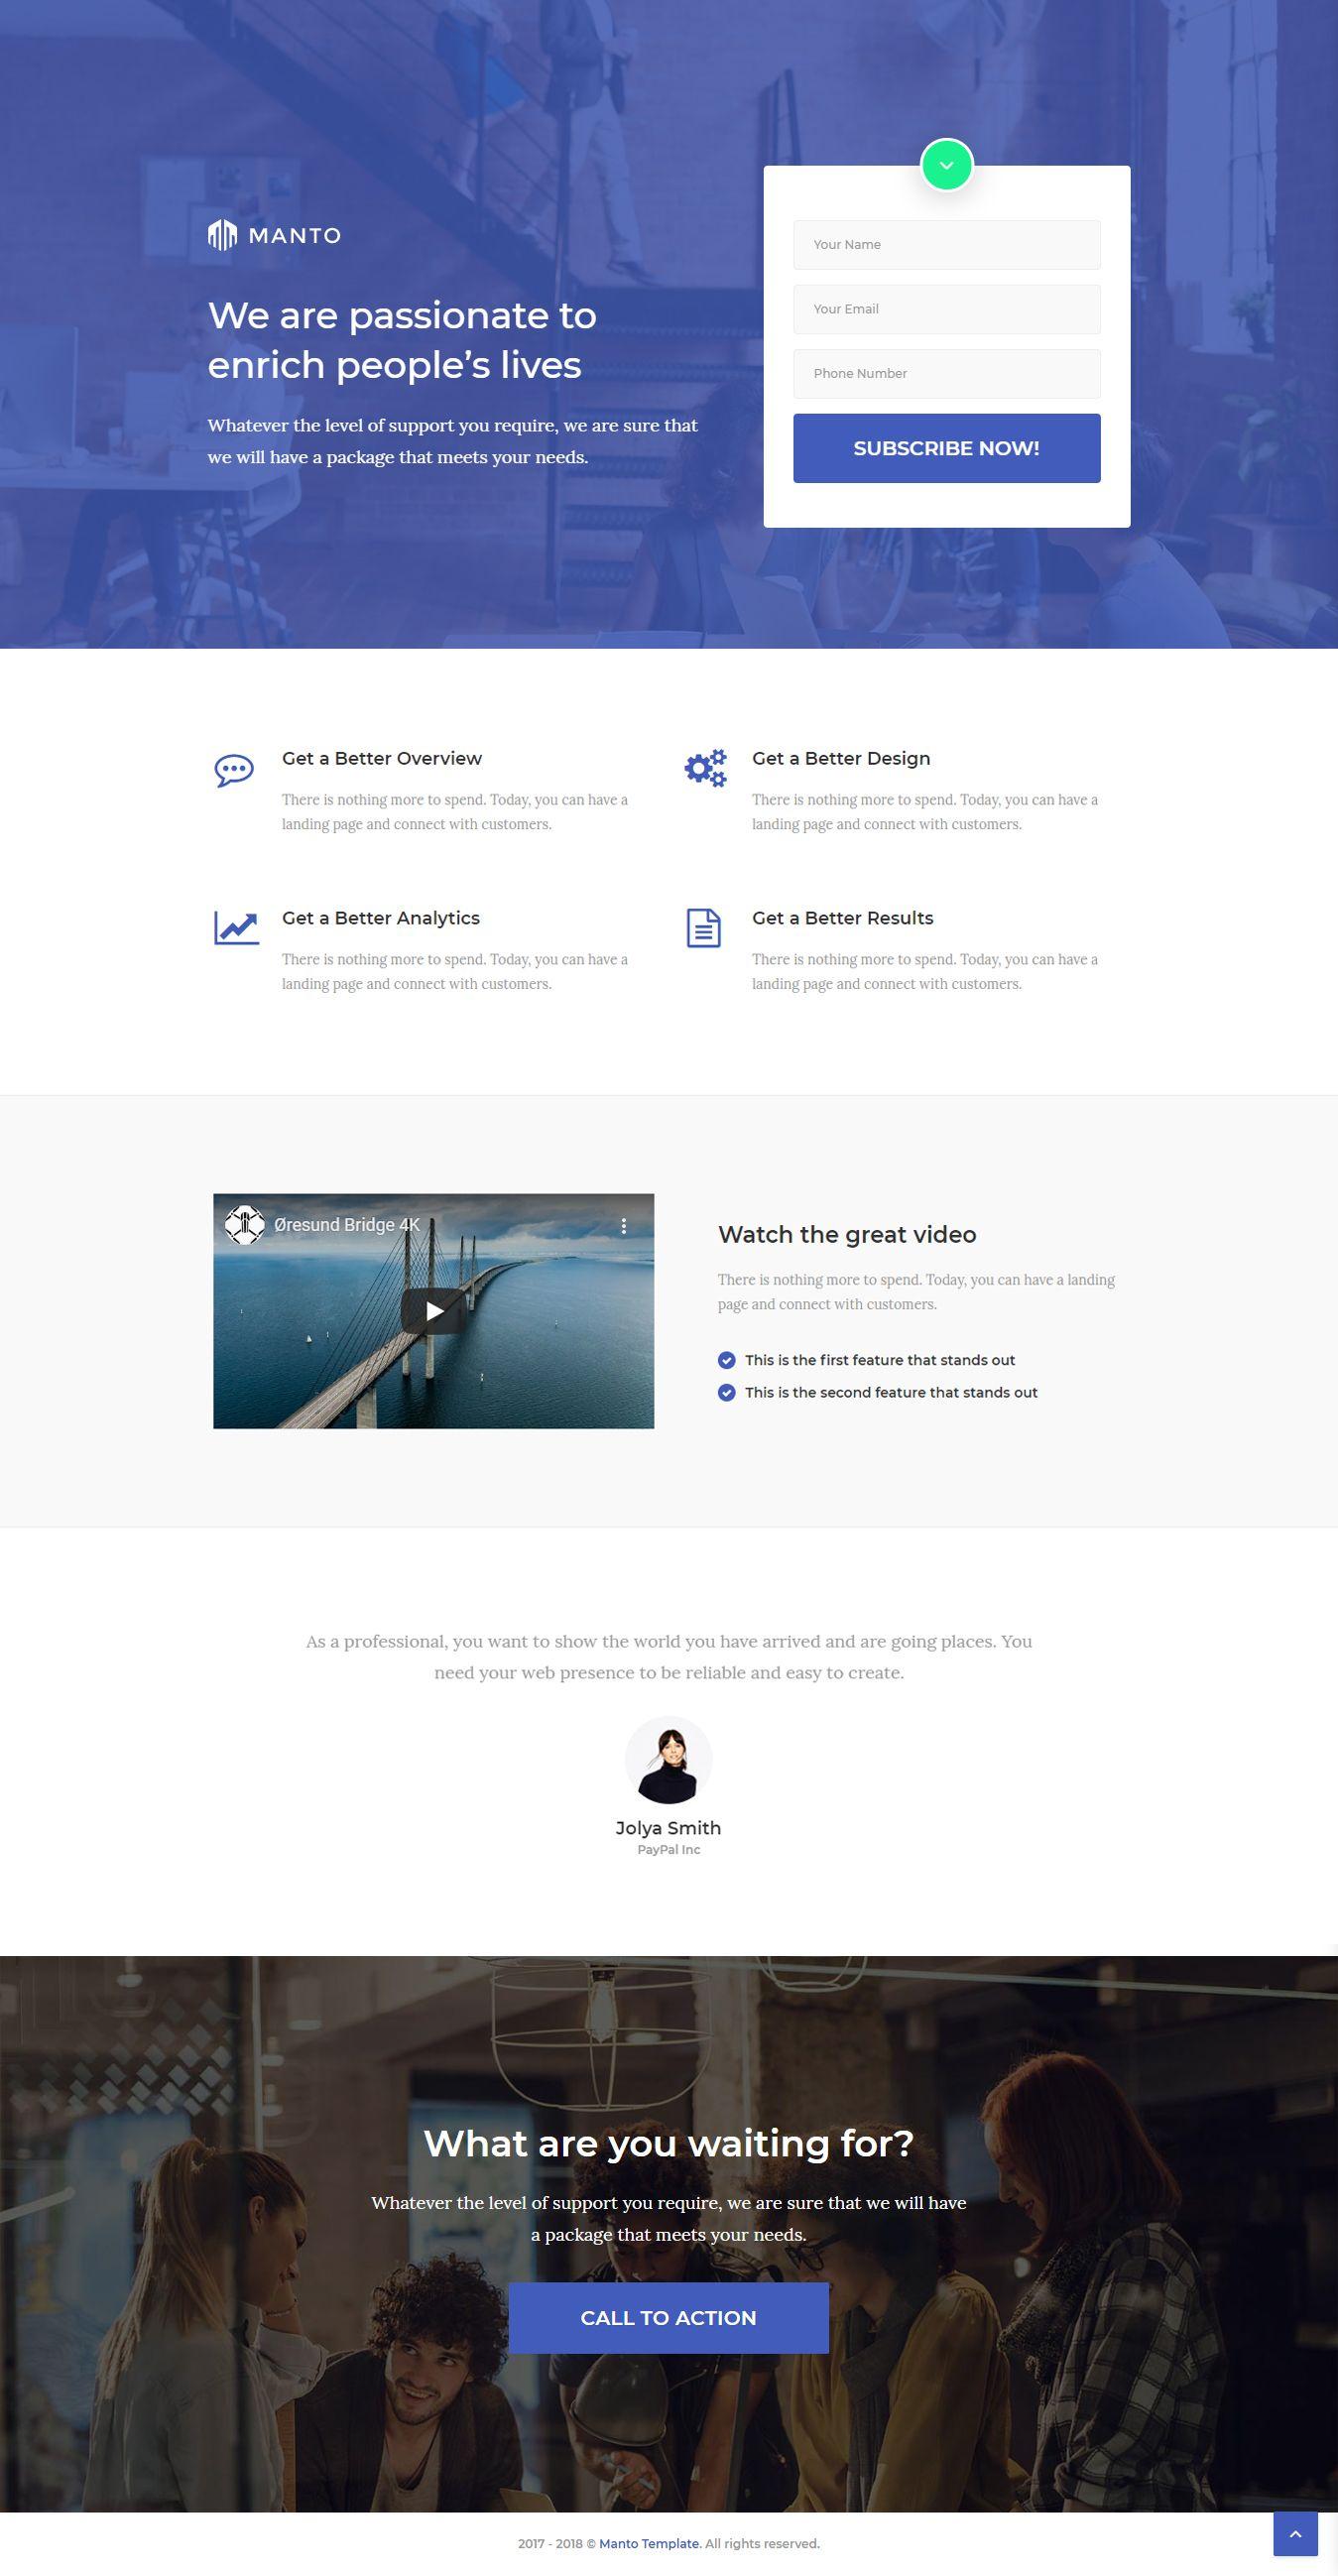 Lead Generation Landing Page Html Website Template In 2020 Lead Generation Landing Page Website Template Design